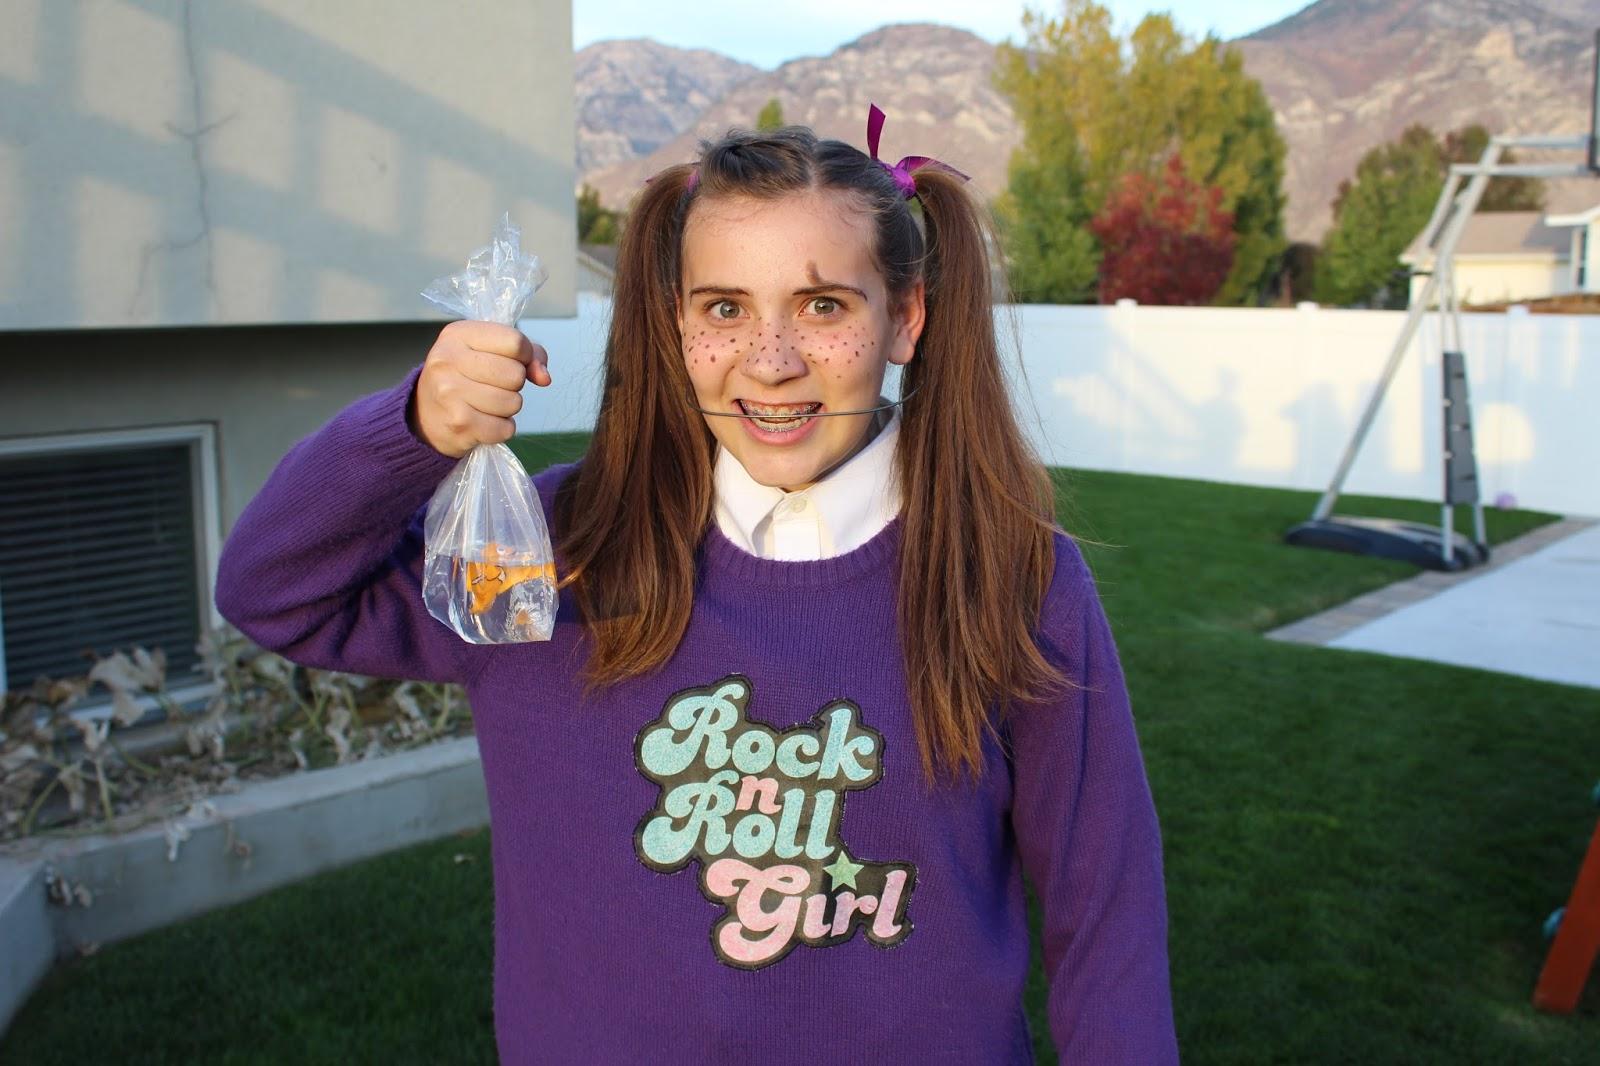 darla finding nemo halloween costume & sc 1 st youtube